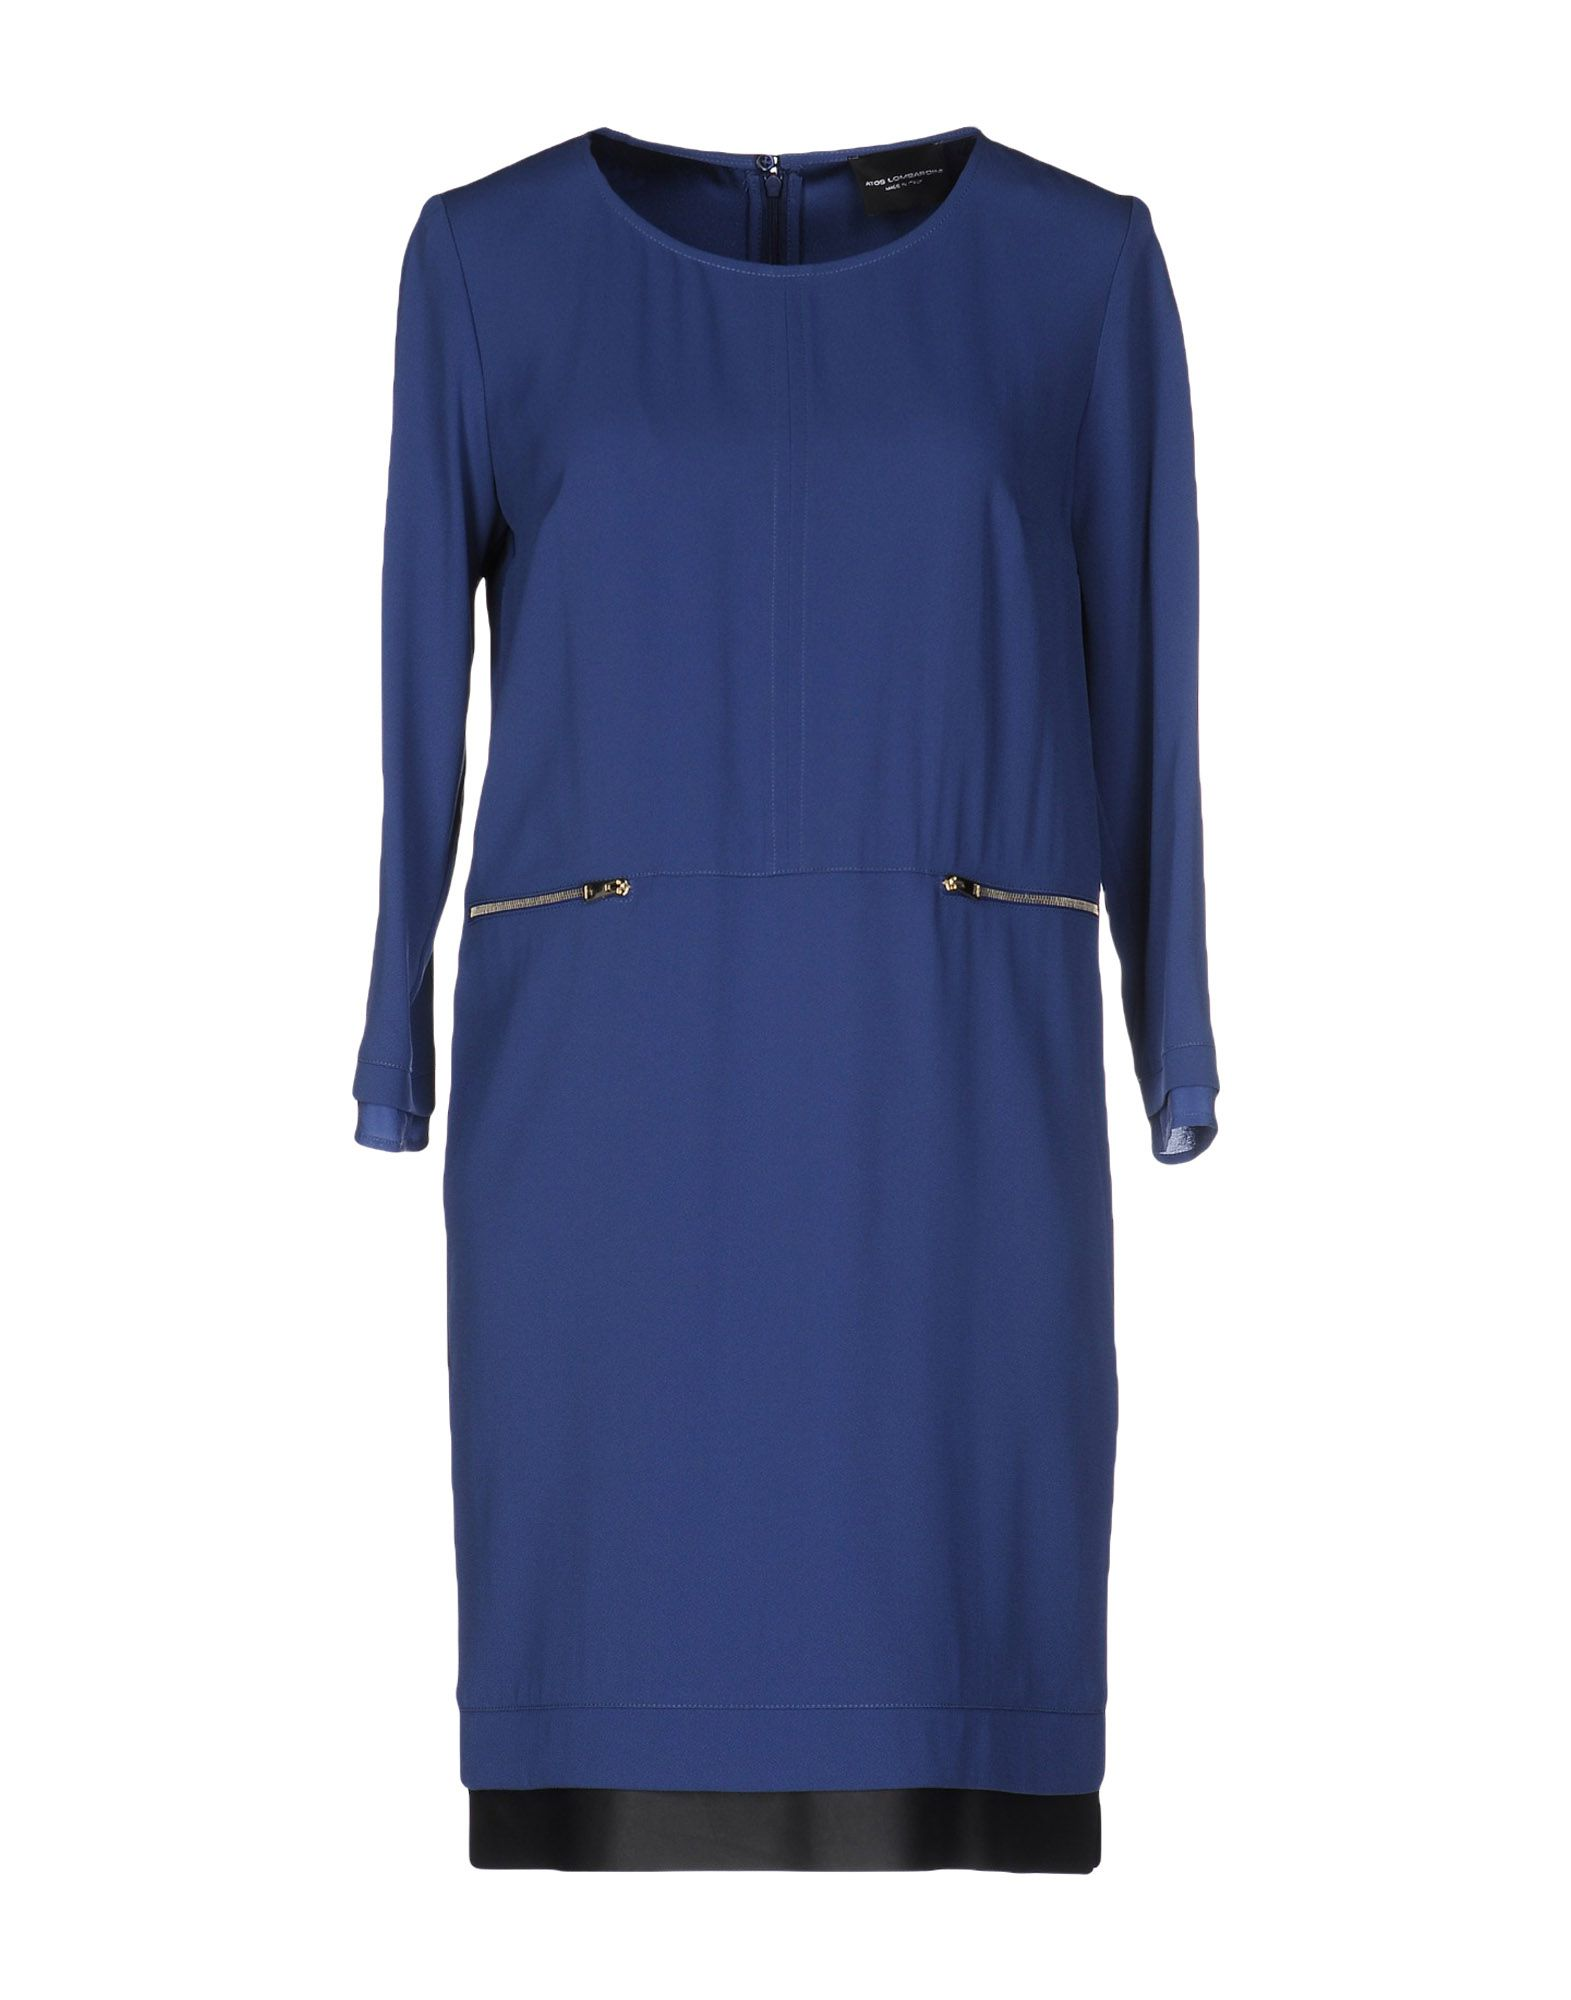 ATOS LOMBARDINI Damen Kurzes Kleid Farbe Blaugrau Größe 2